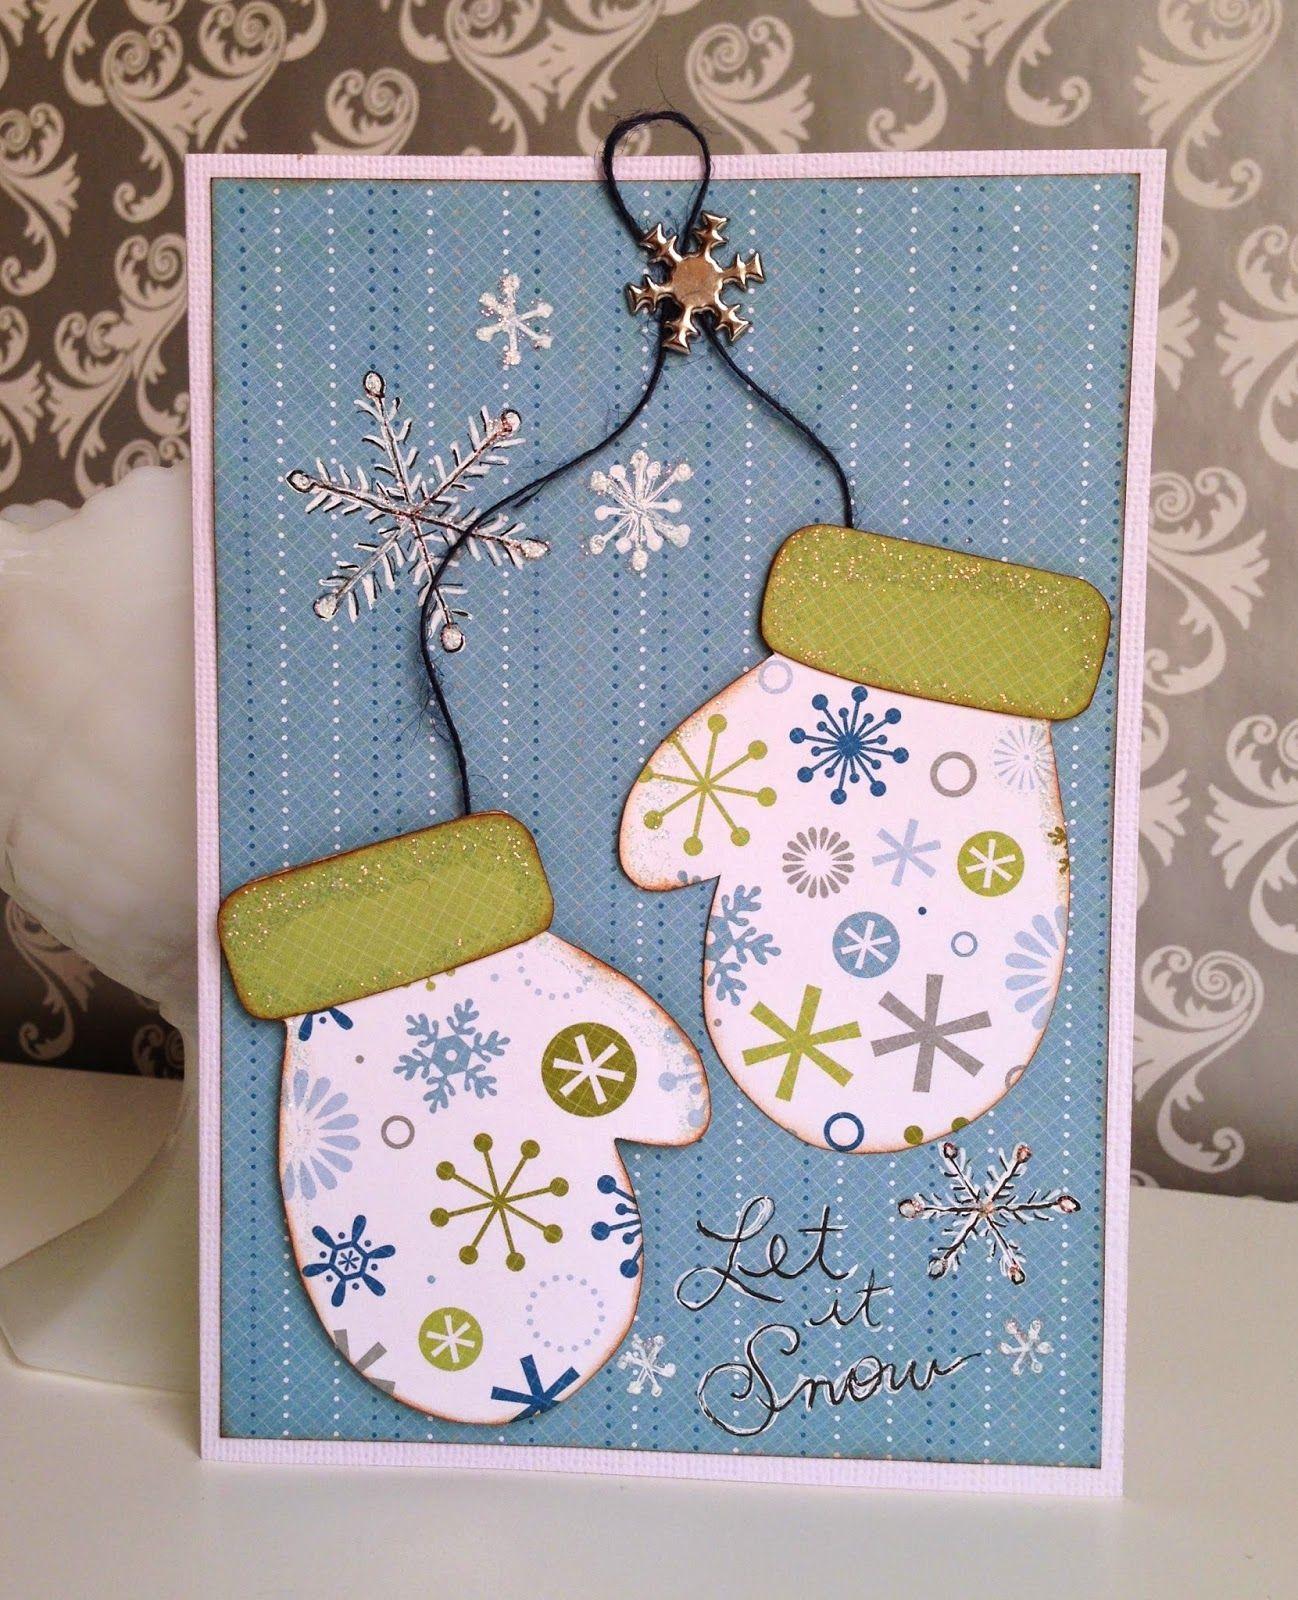 Snow Card By Gail Owens For @kiwilane Using Kiwi Lane